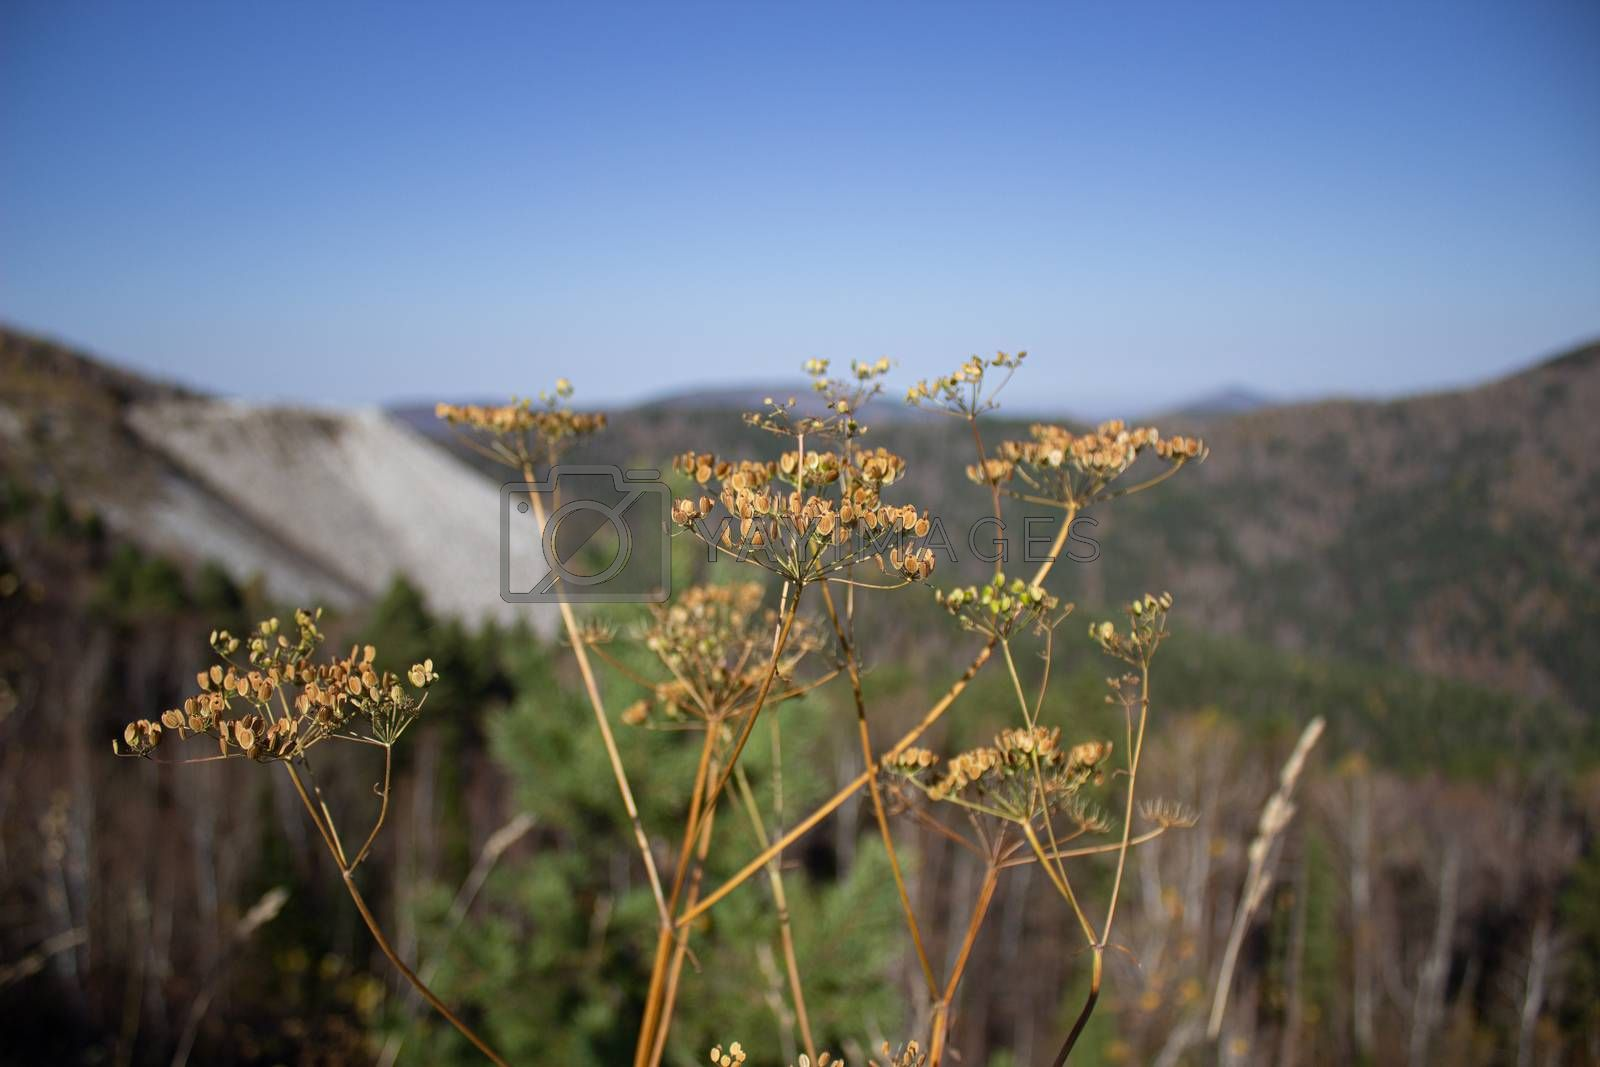 Two Eryngium monocephalum, Beautiful dry thistle bloom plant on volcano, dry, climate, mountain range, summit, macro close up, foreground, background mountains